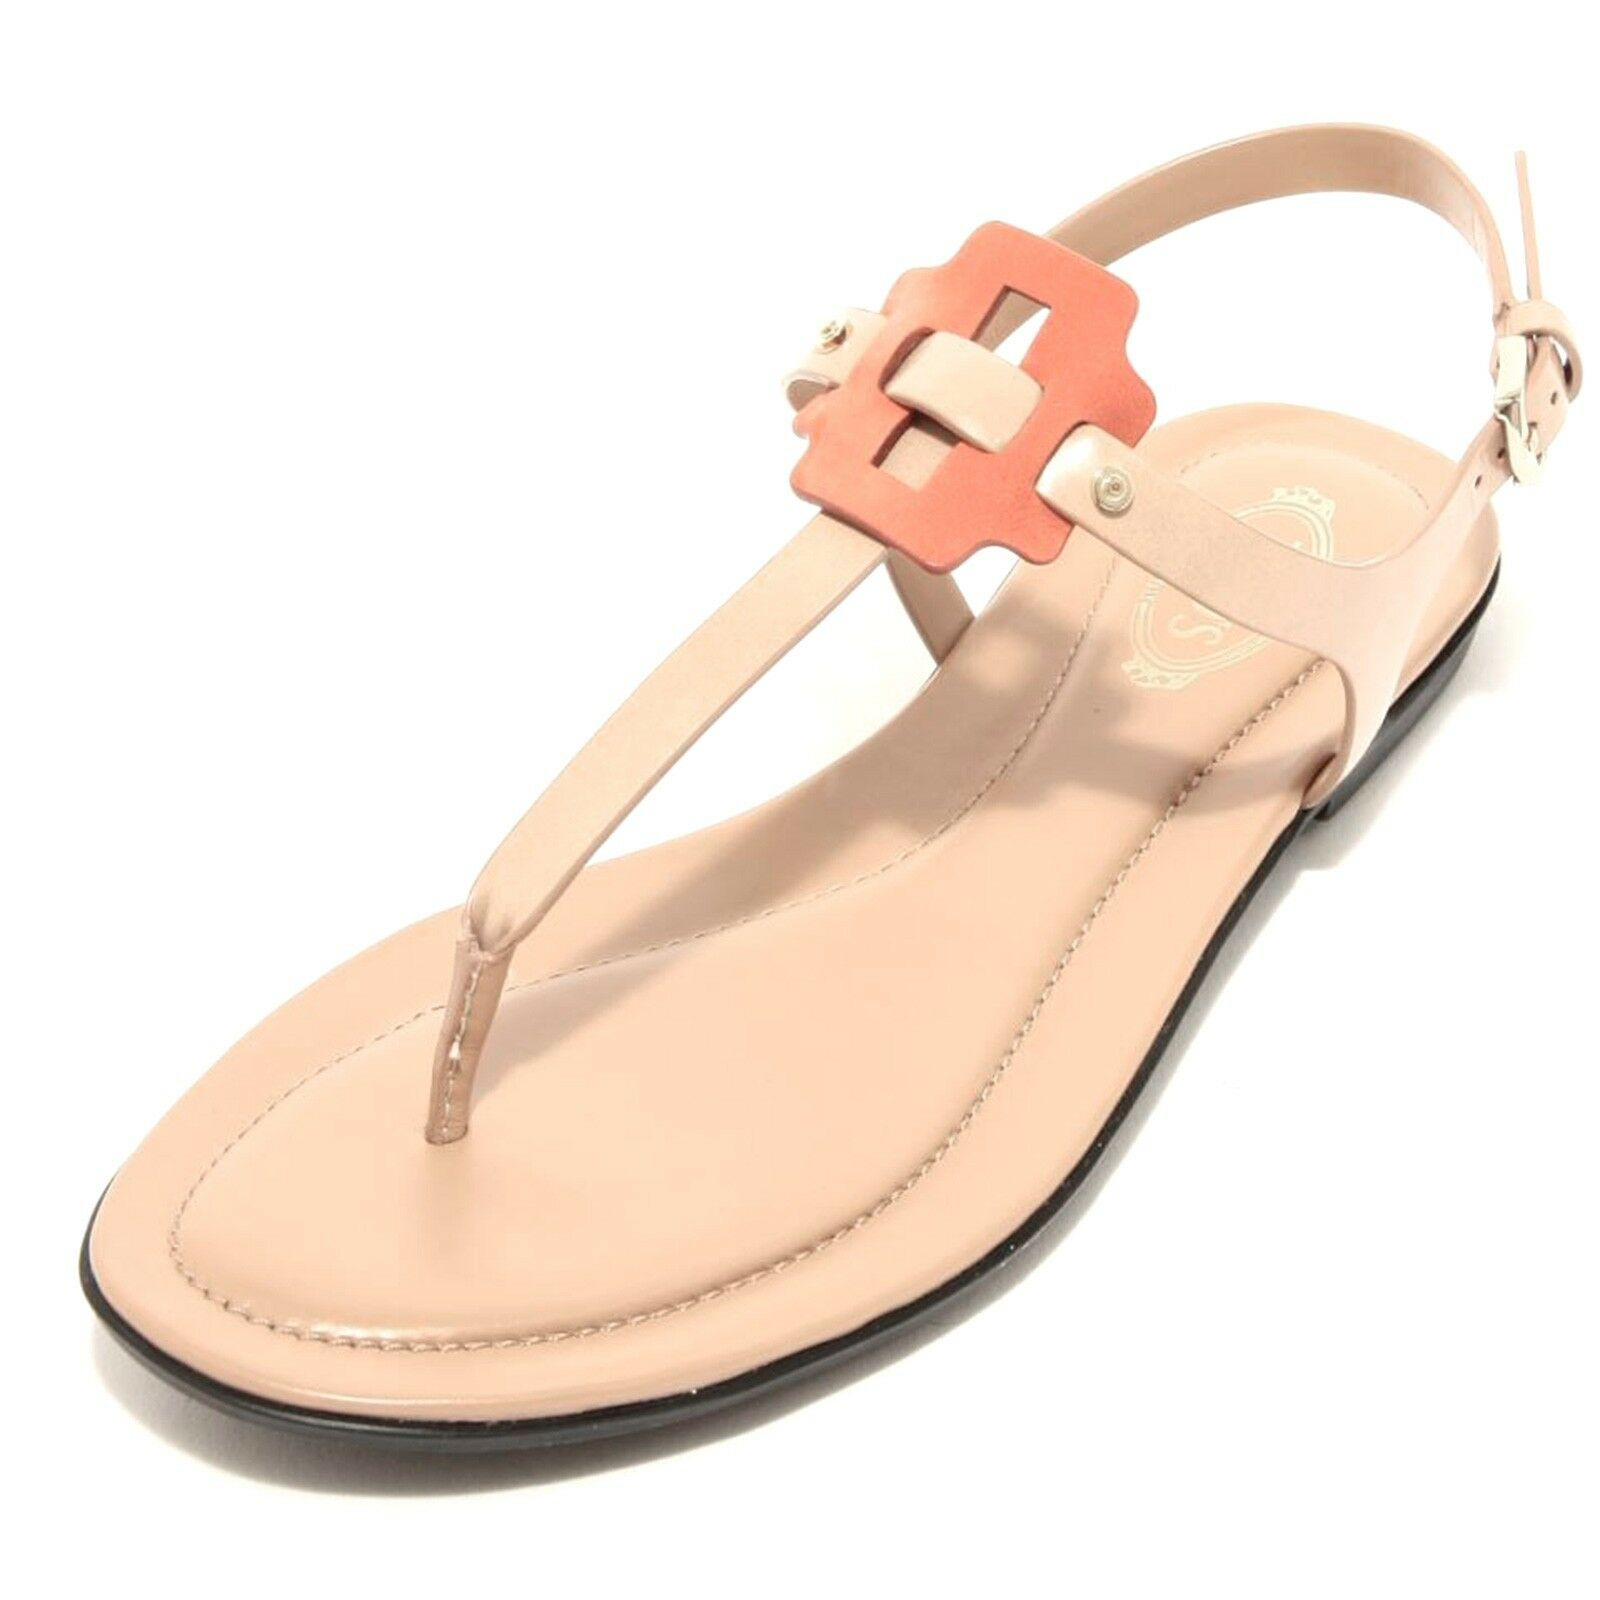 96611 Flip Flop TOD's läder gummiskor Sandal kvinna skor skor skor  spara 50% -75% rabatt